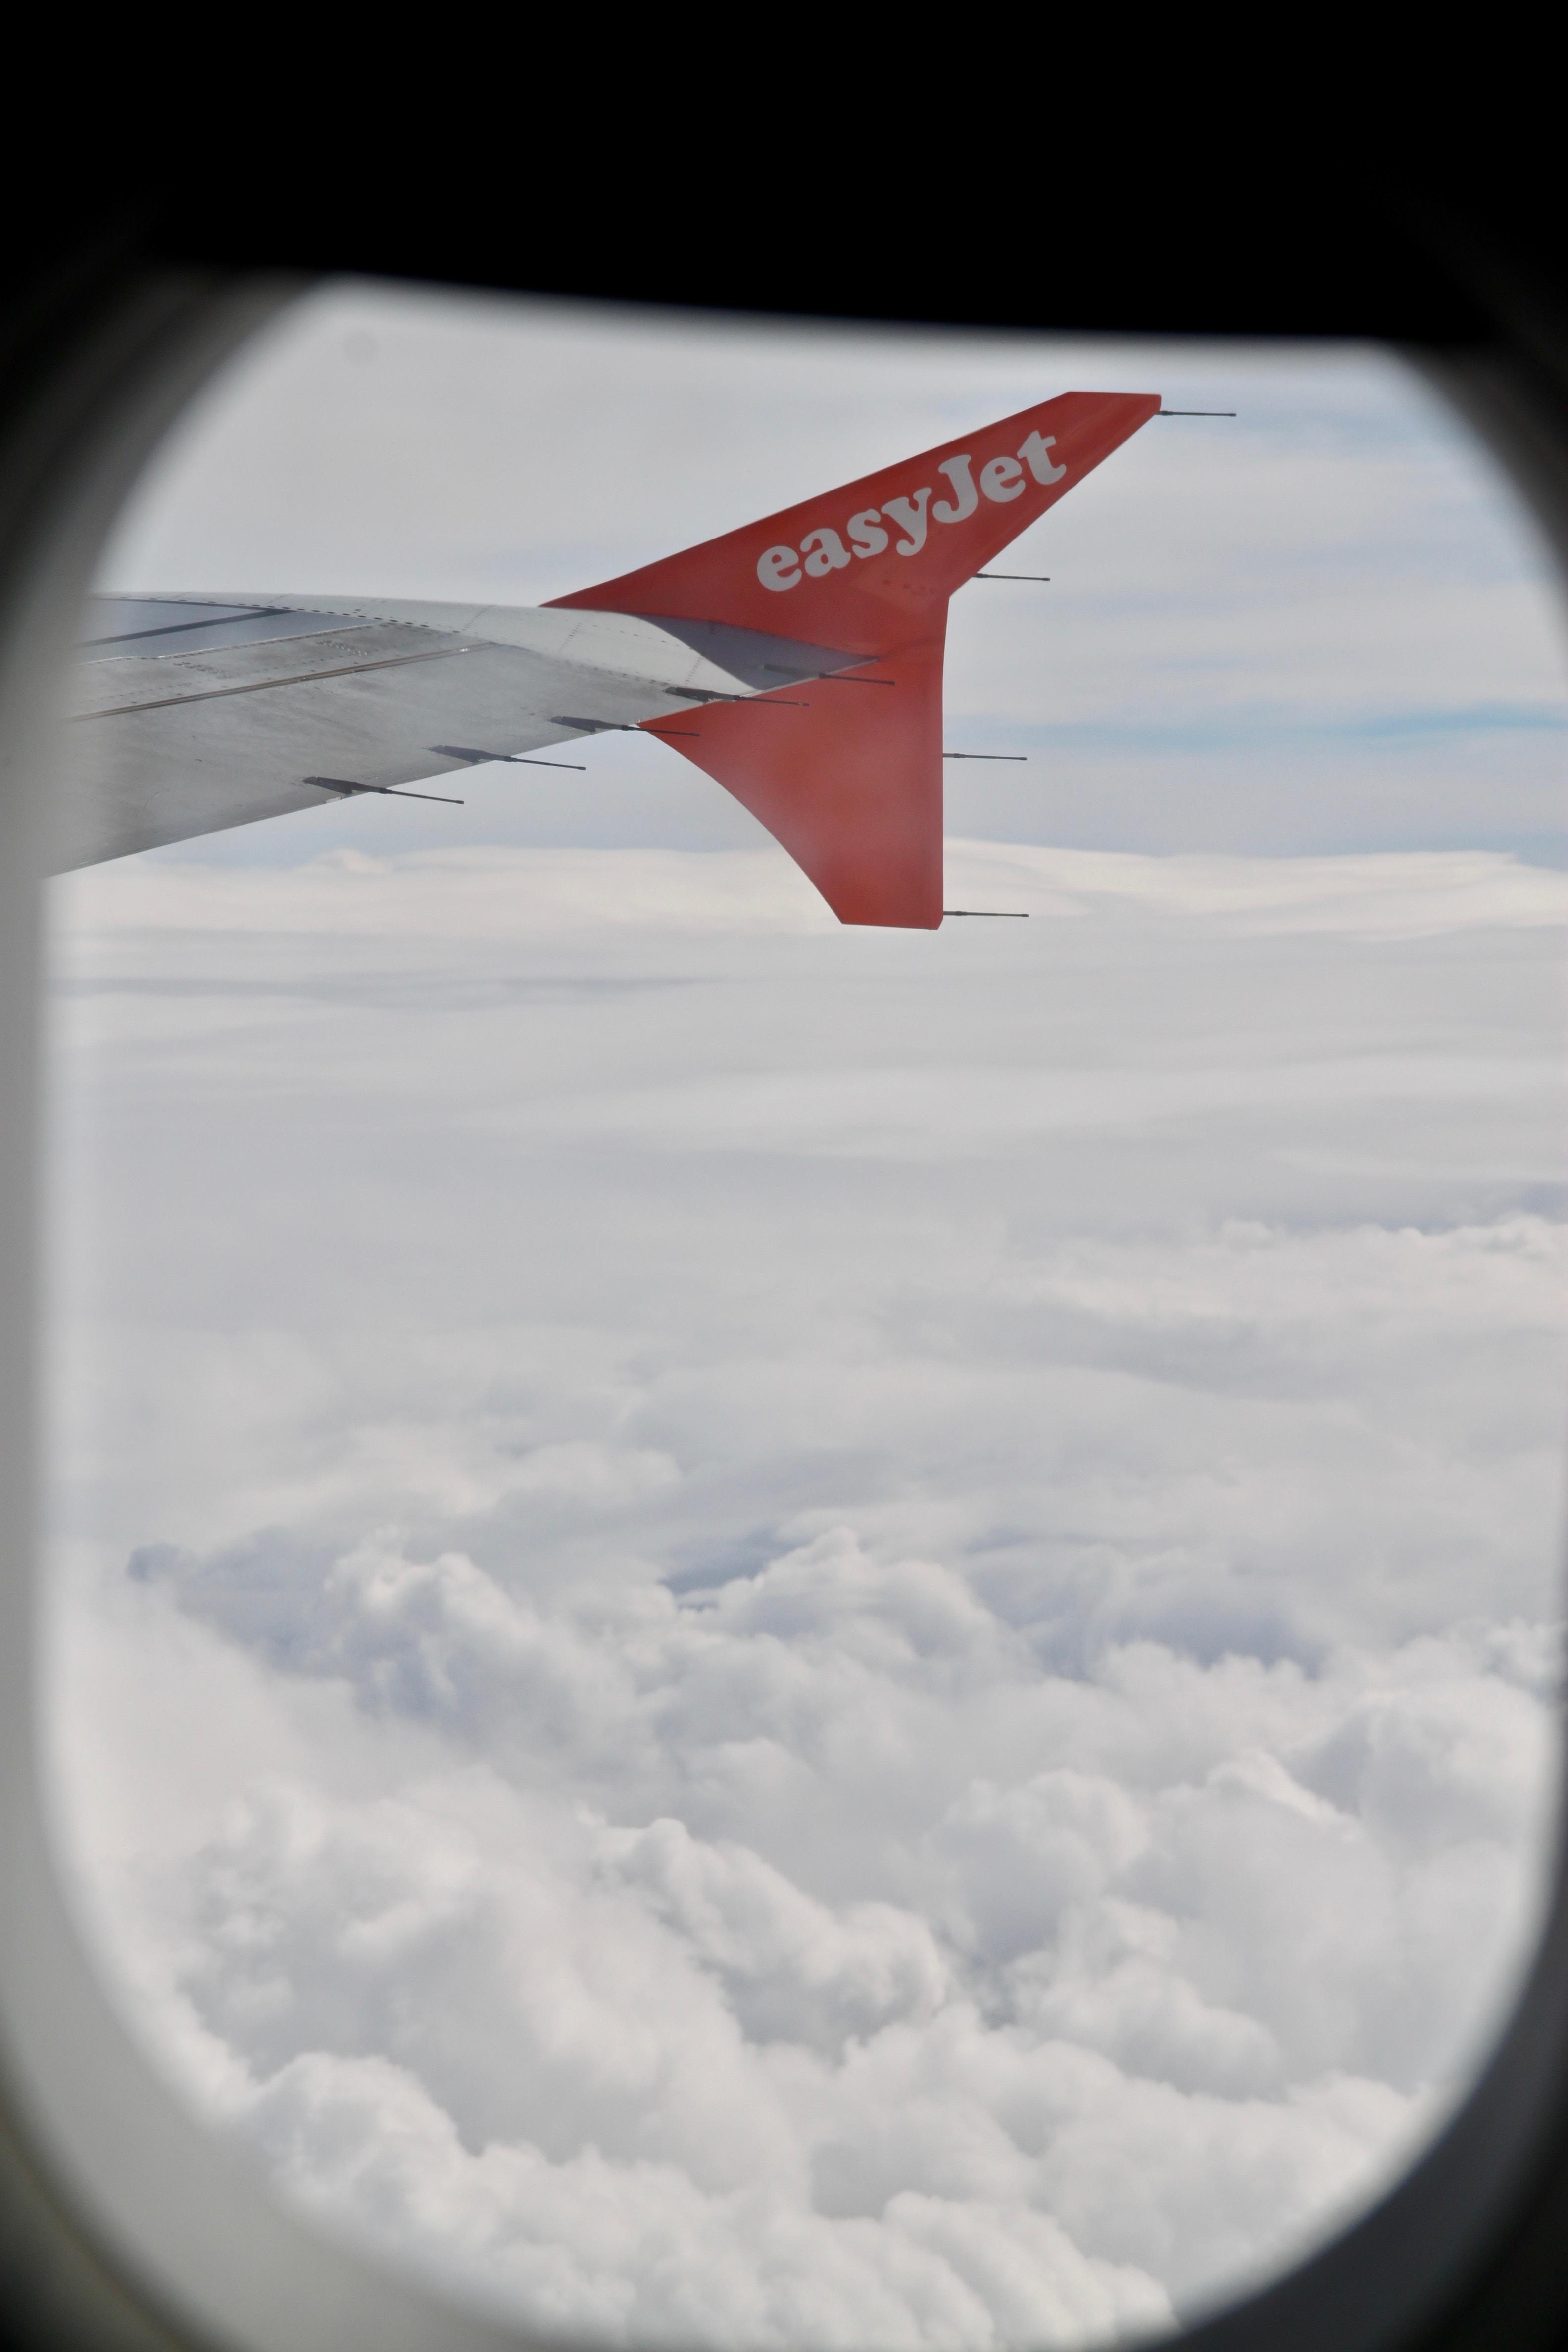 easy jet plane tail